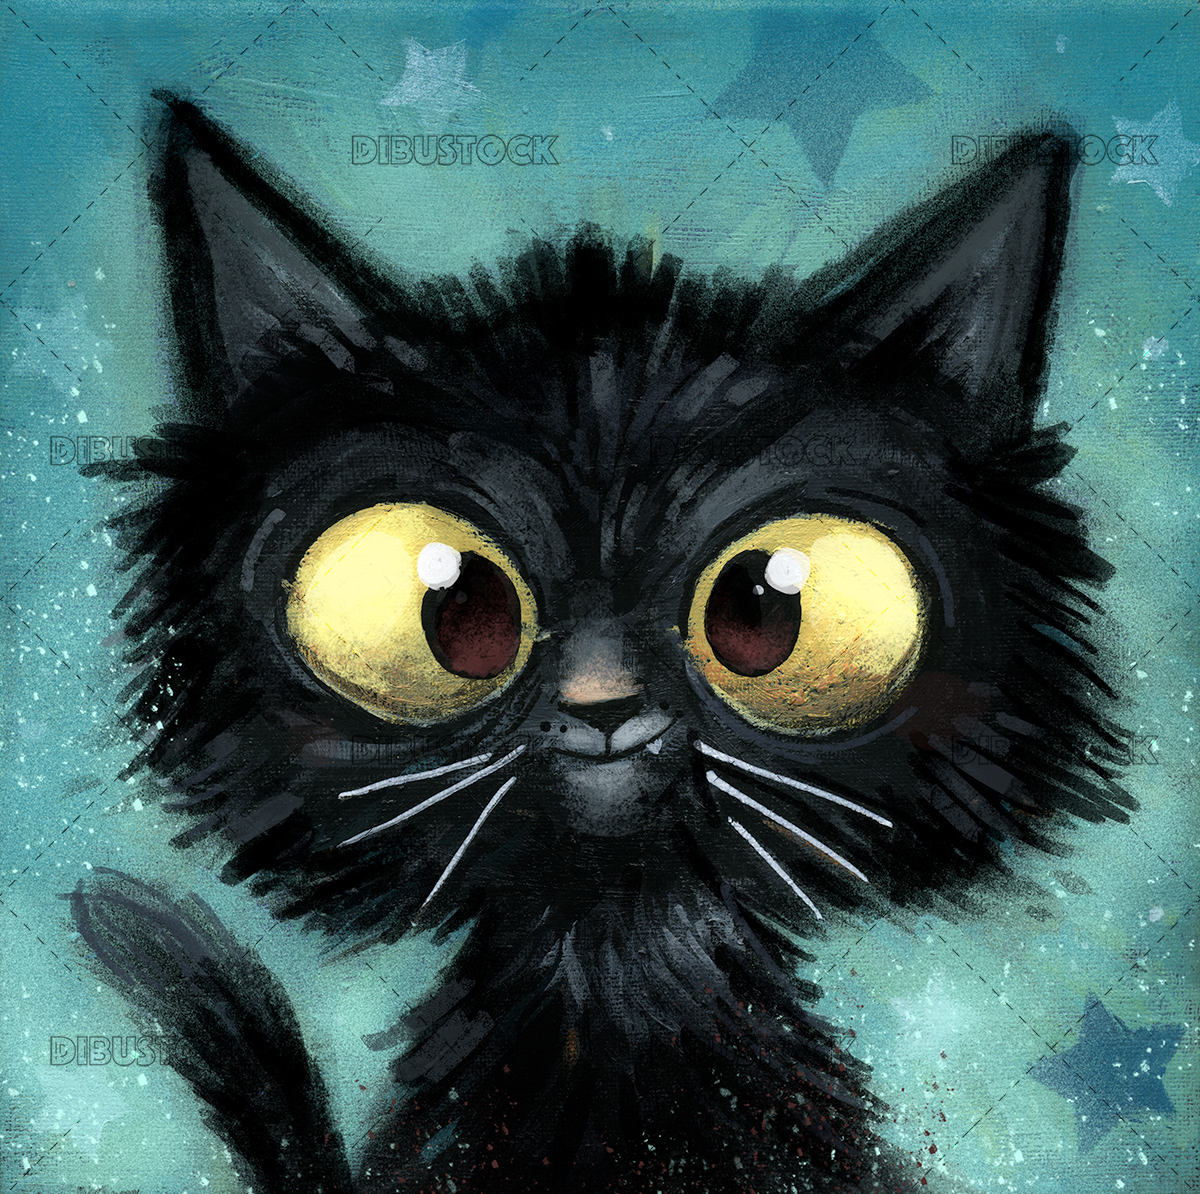 Black cat illustration with background